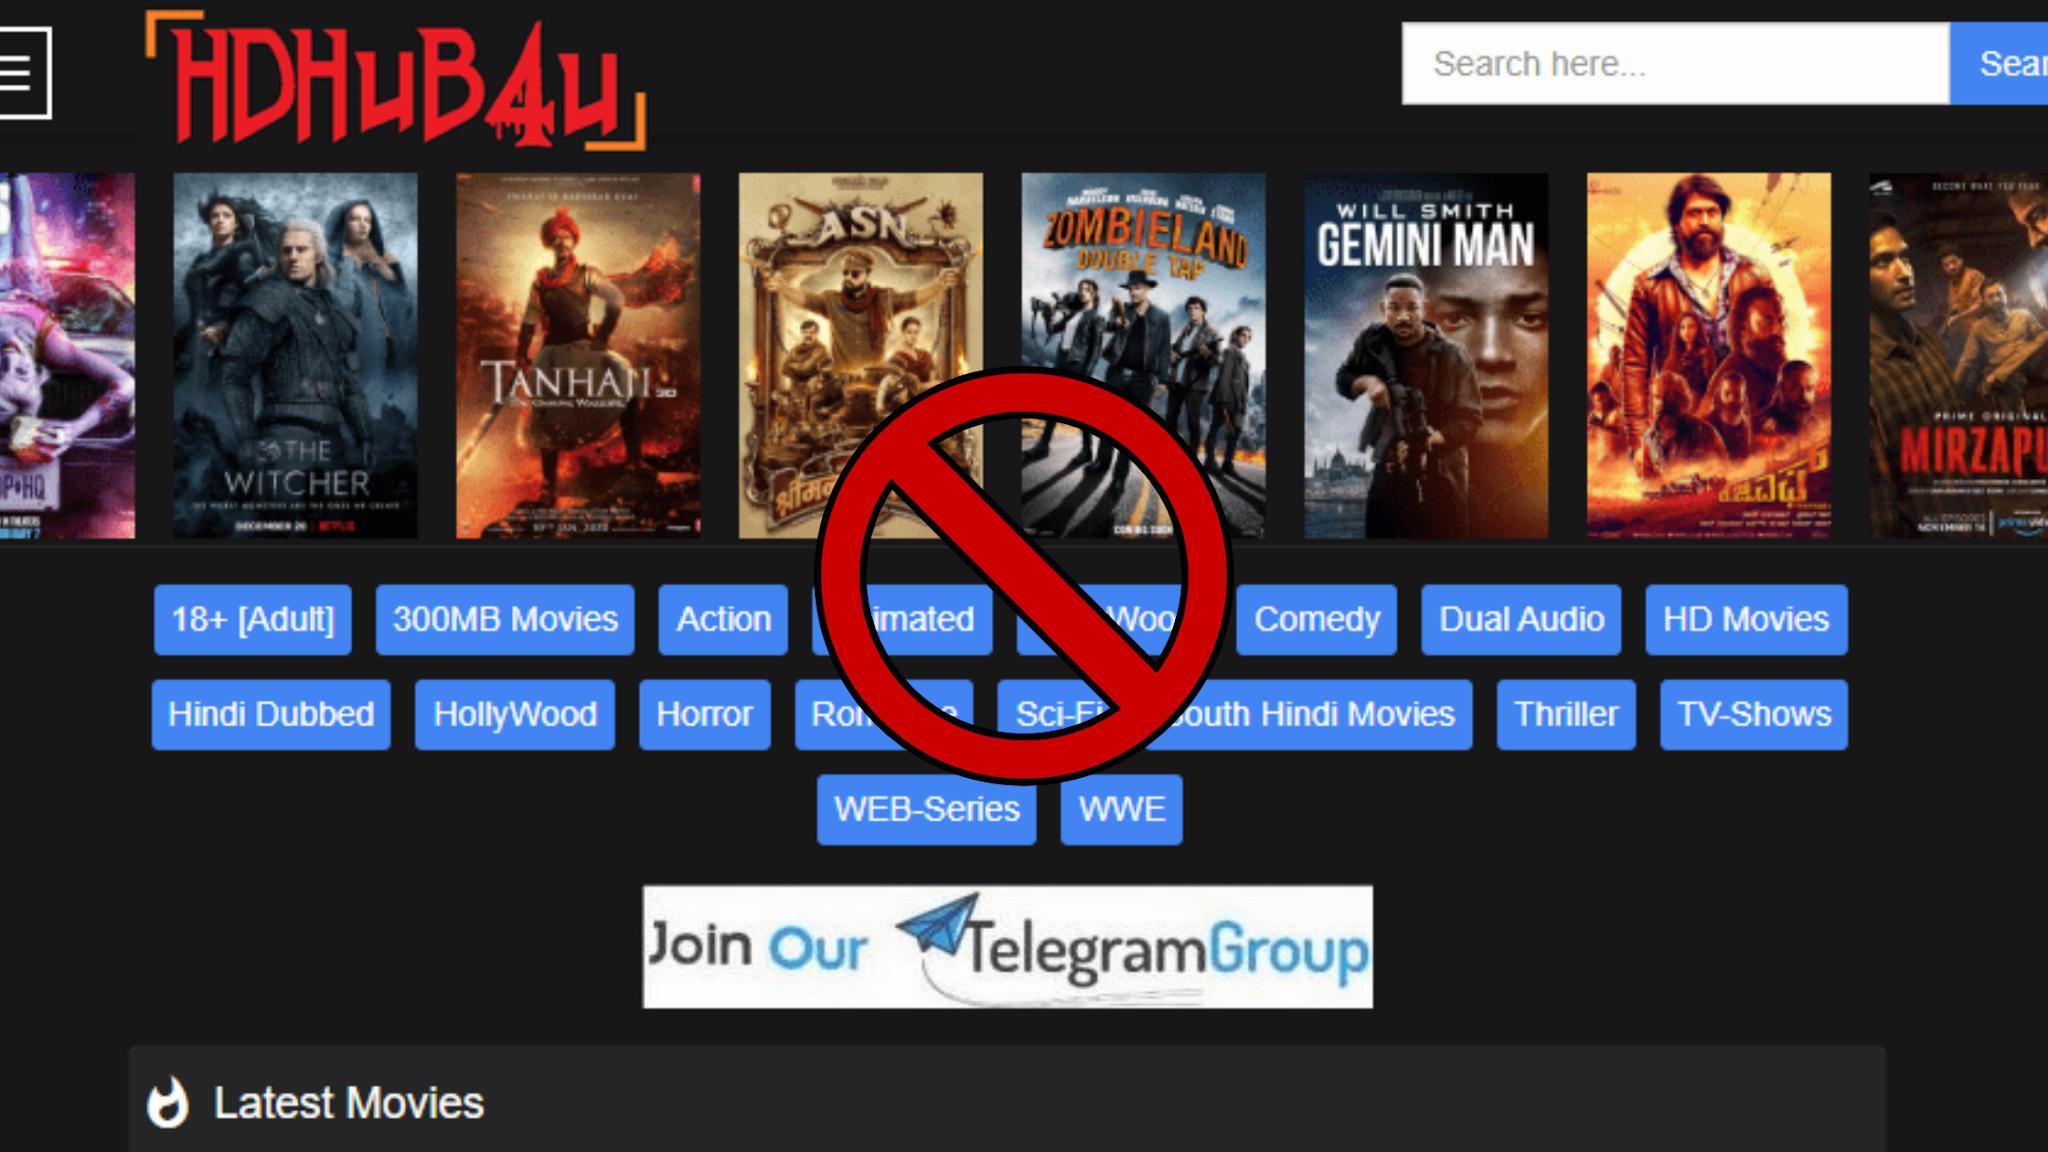 Hdhub4u 2021 ~ HD Hub Piracy Movie Website Link, Download 300MB Movie, Horror, South Hindi Movie, Hindi Dubbed, Web Series, News About Hdhub 4u